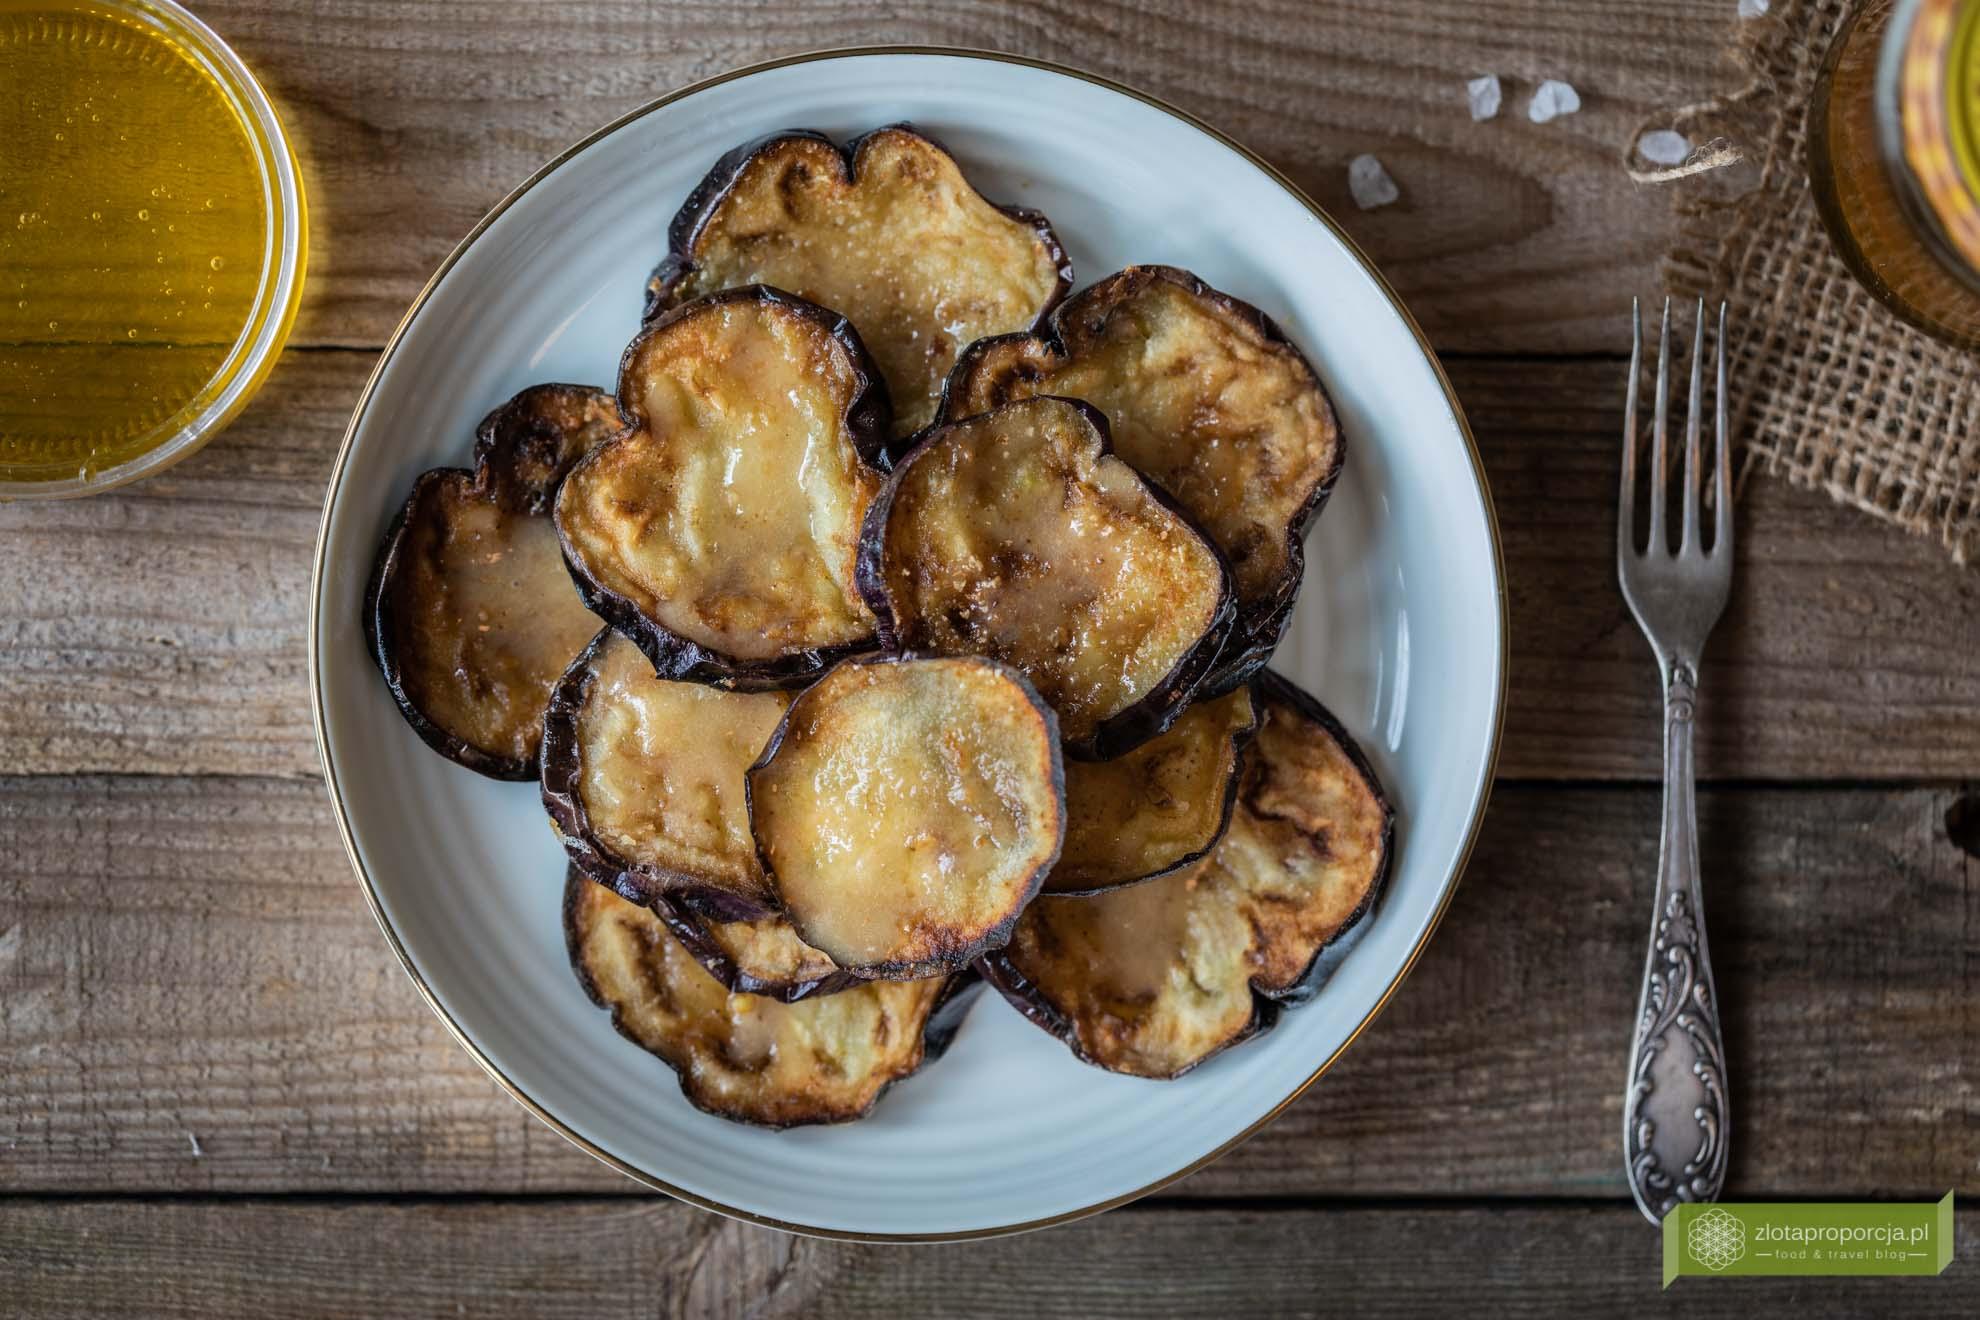 Smażone bakłażany z miodem; berenjenas fritas con miel; kuchnia hiszpańska; kuchnia Andaluzji; tapas; przepis smażone bakłażany;